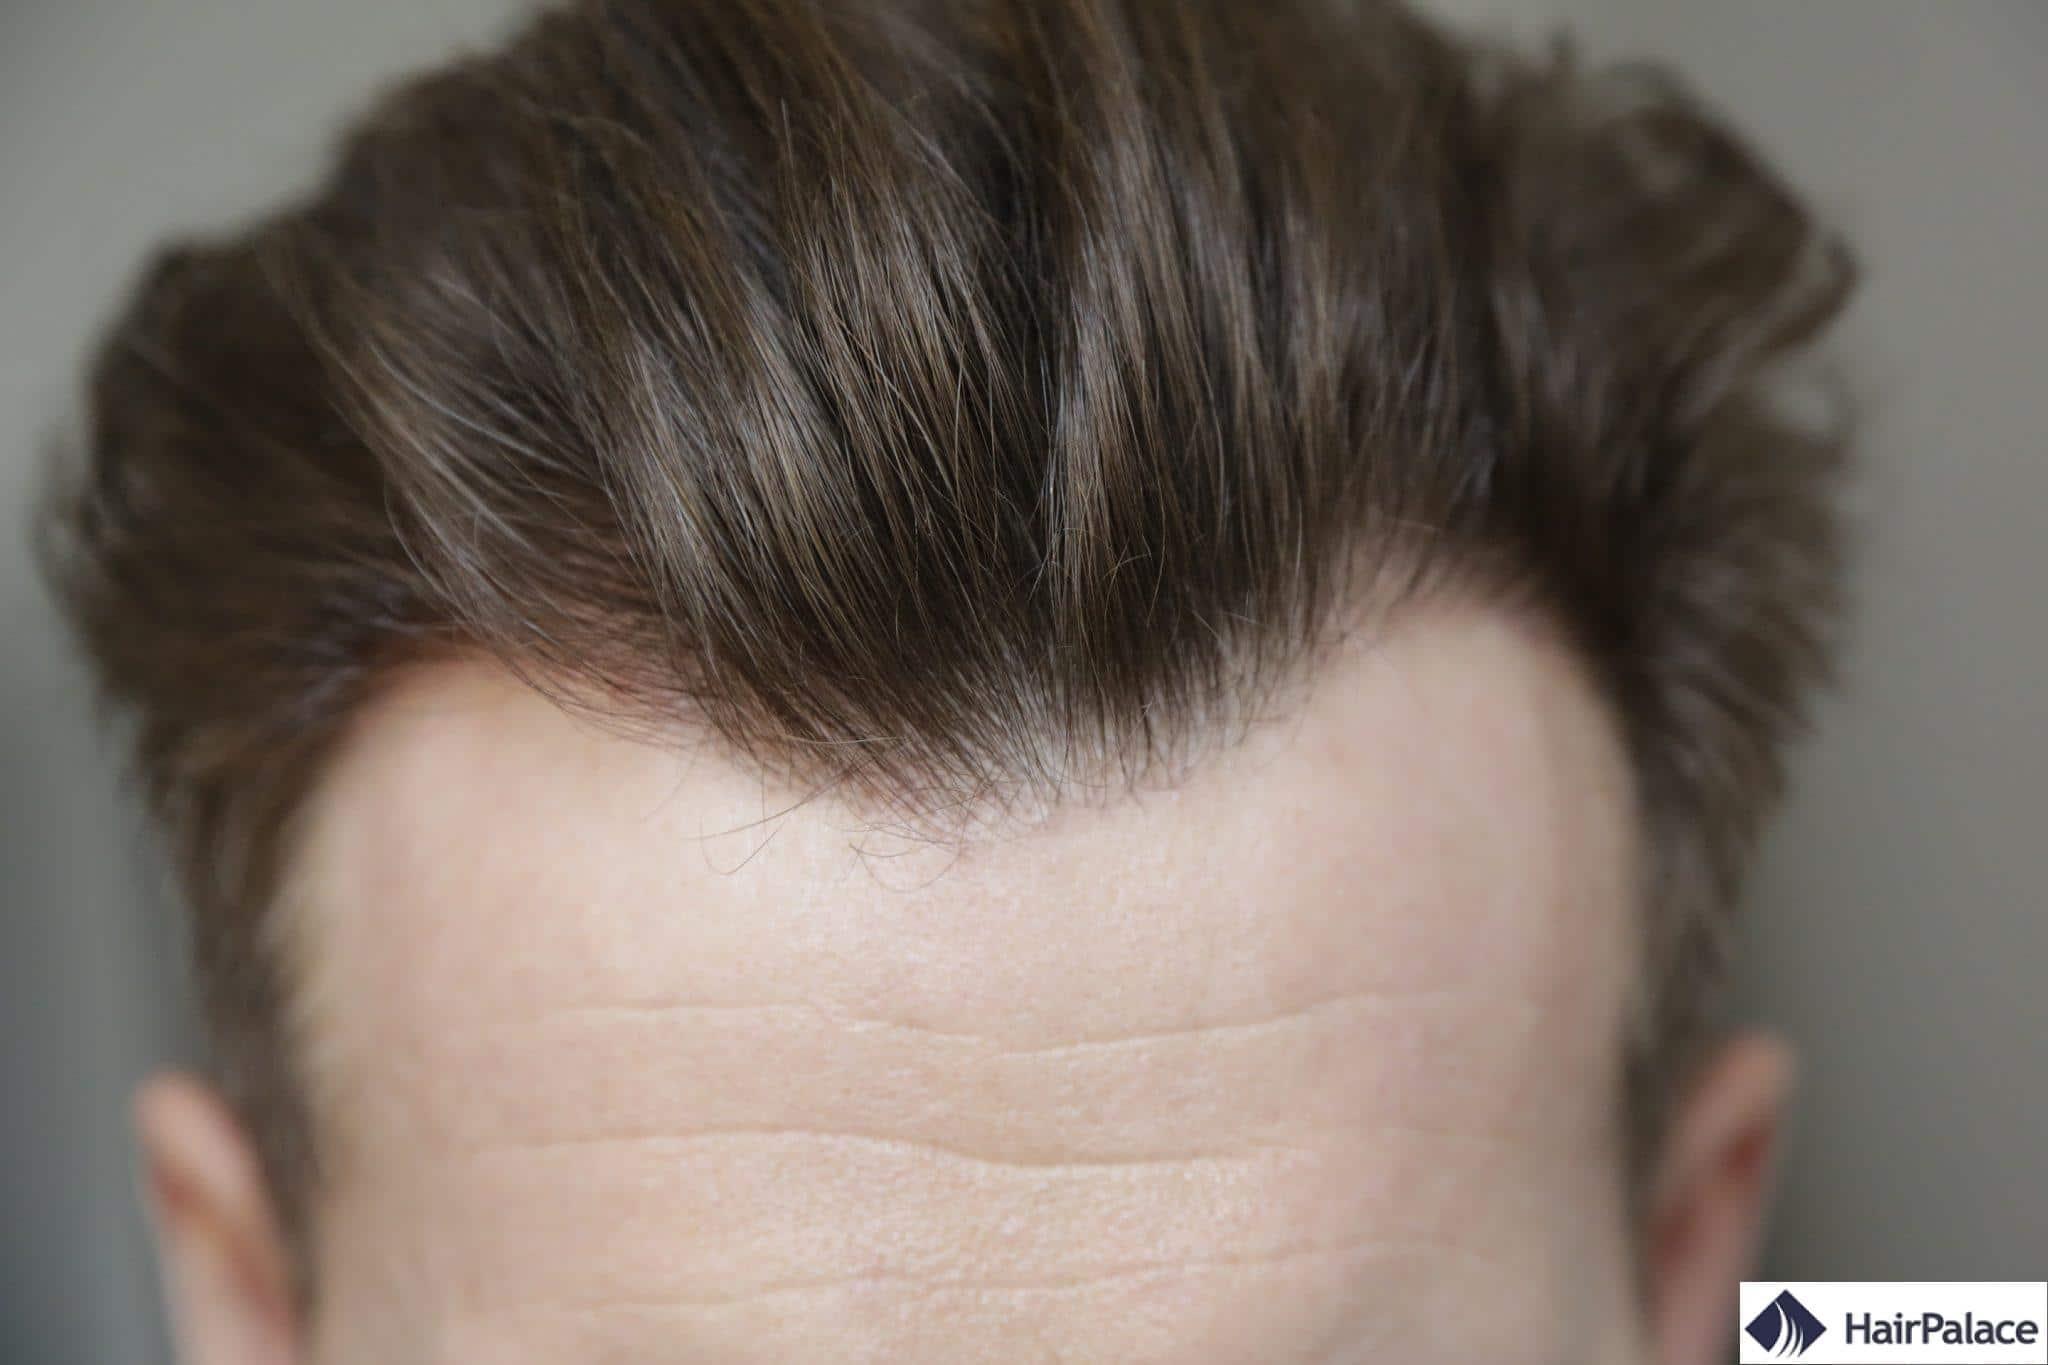 resultat final greffe cheveux fue 1 annee